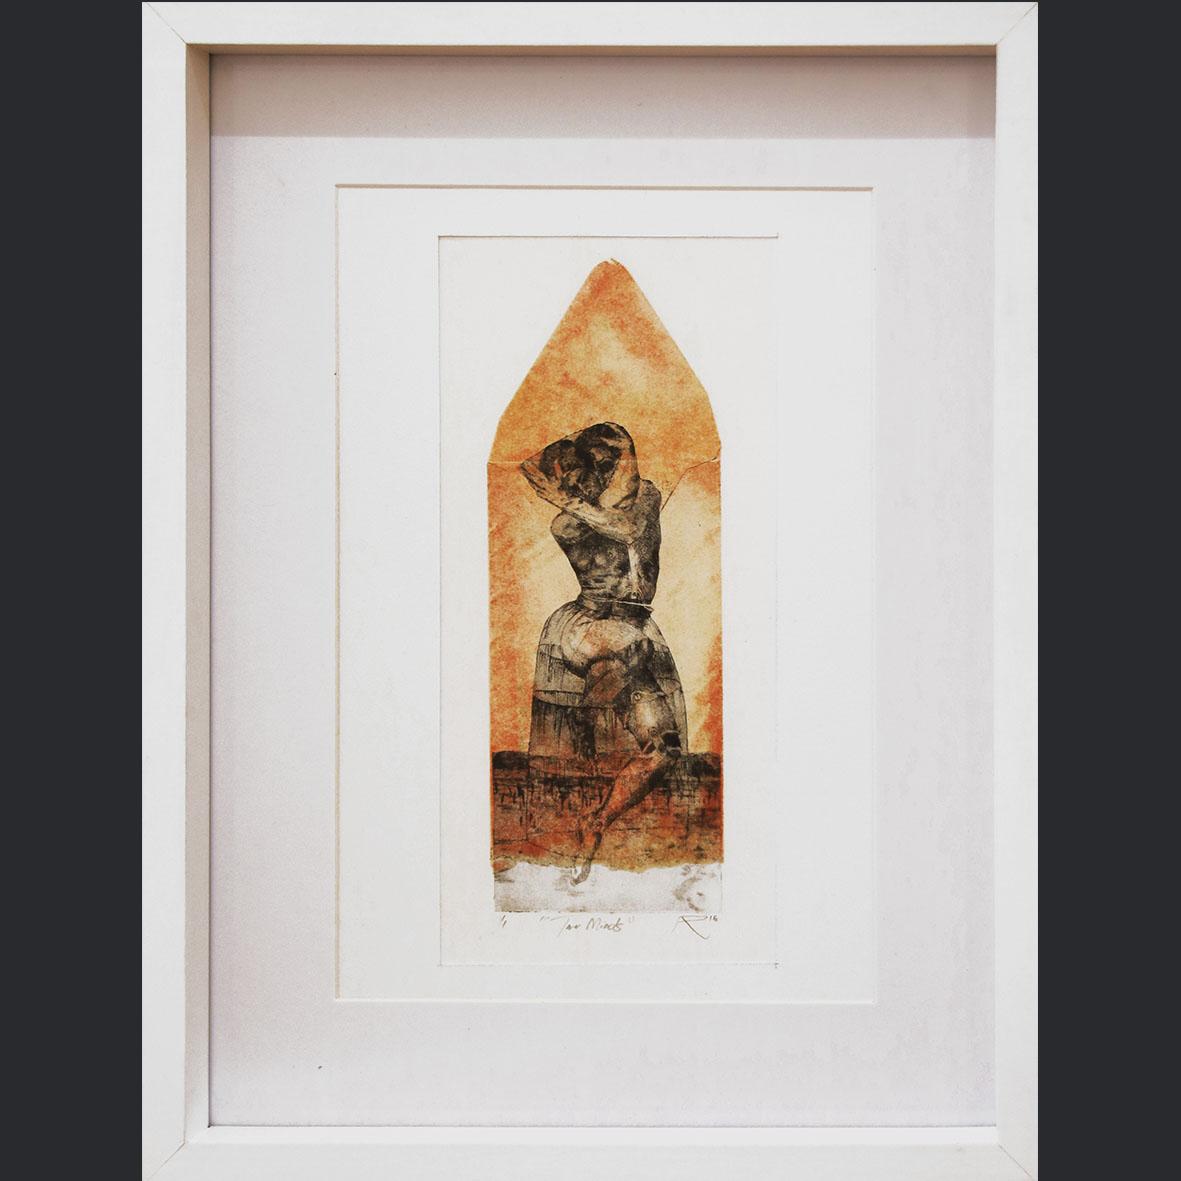 Adrian Ranger, Two Minds - 1 of 1, 2018, Hyprid Print, 32.5 x 42.5 cm